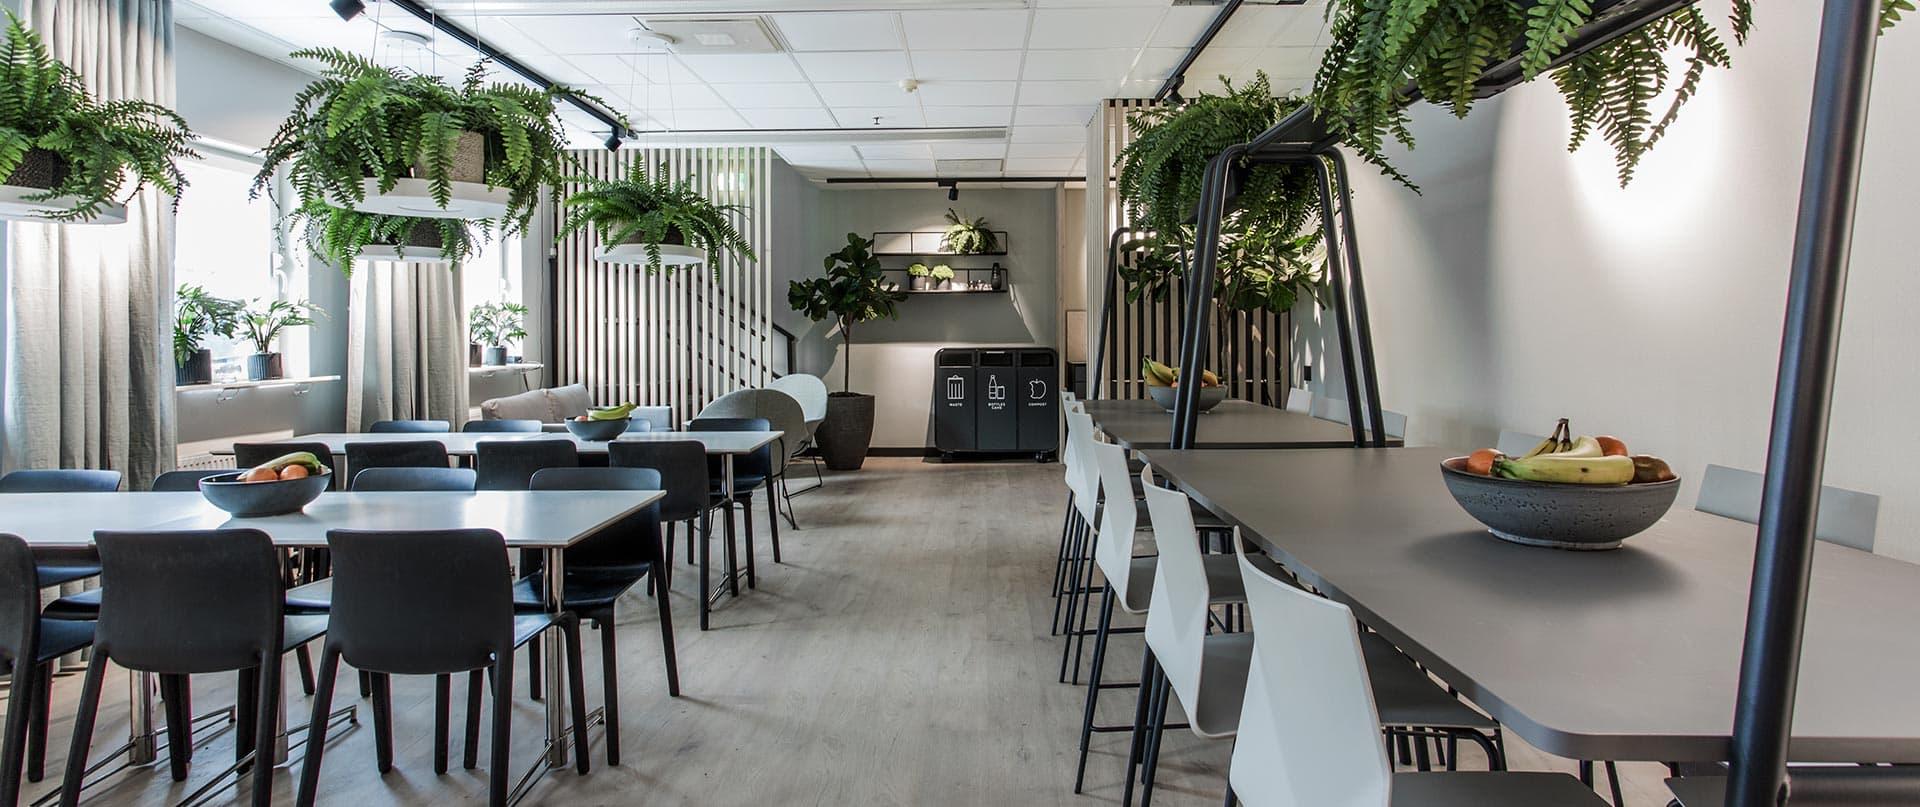 Lunchrum med gröna växter ICA maxi Borås inredningsdesign Joy of Plenty